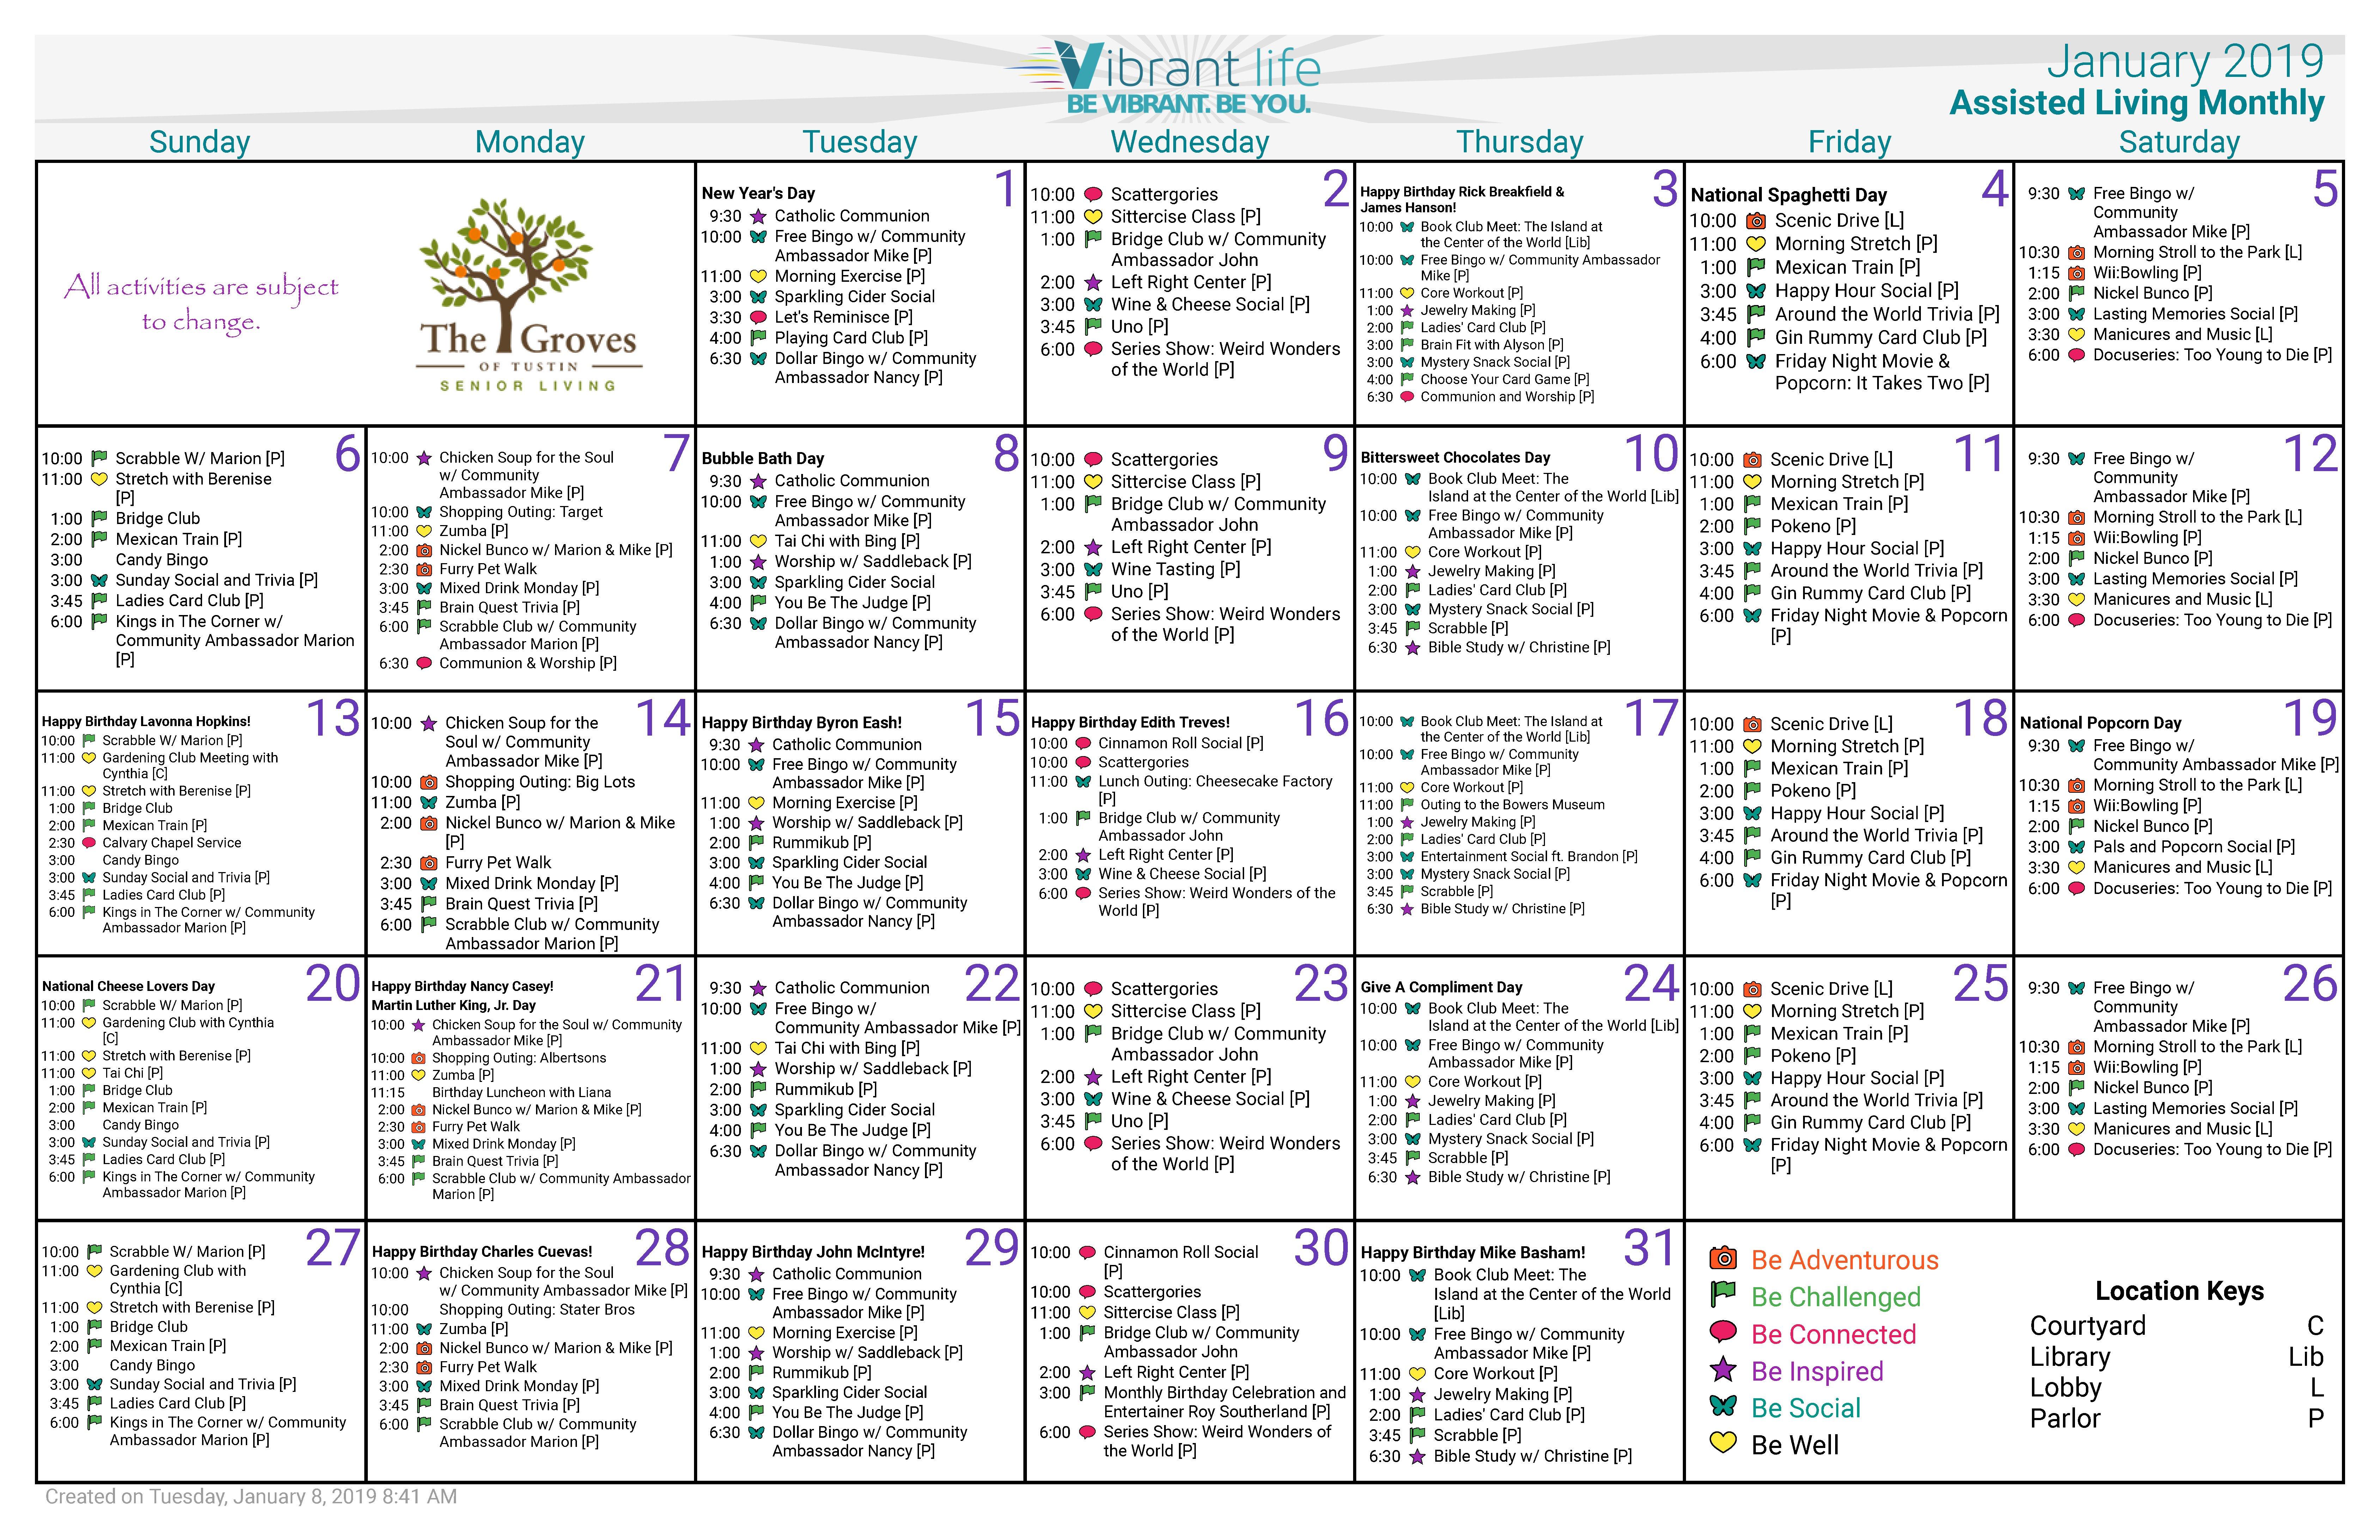 January 2019 Calendar Al – Groves Of Tustin Calendar 2019 At Target